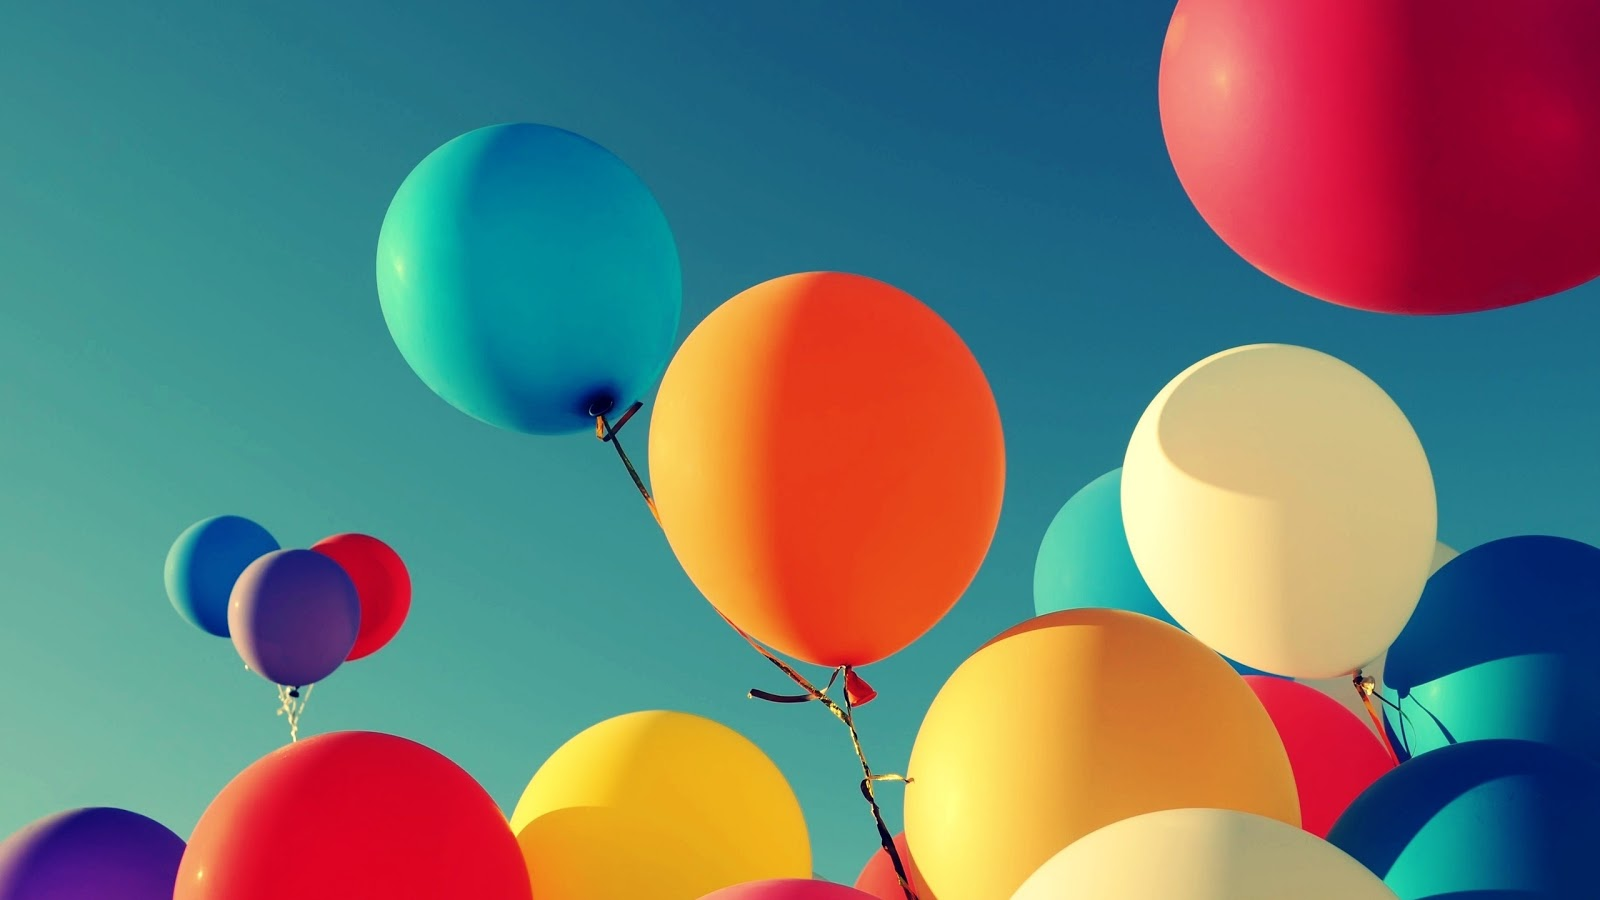 hd balloon plain wallpaper s for desktop 1080px wide free download